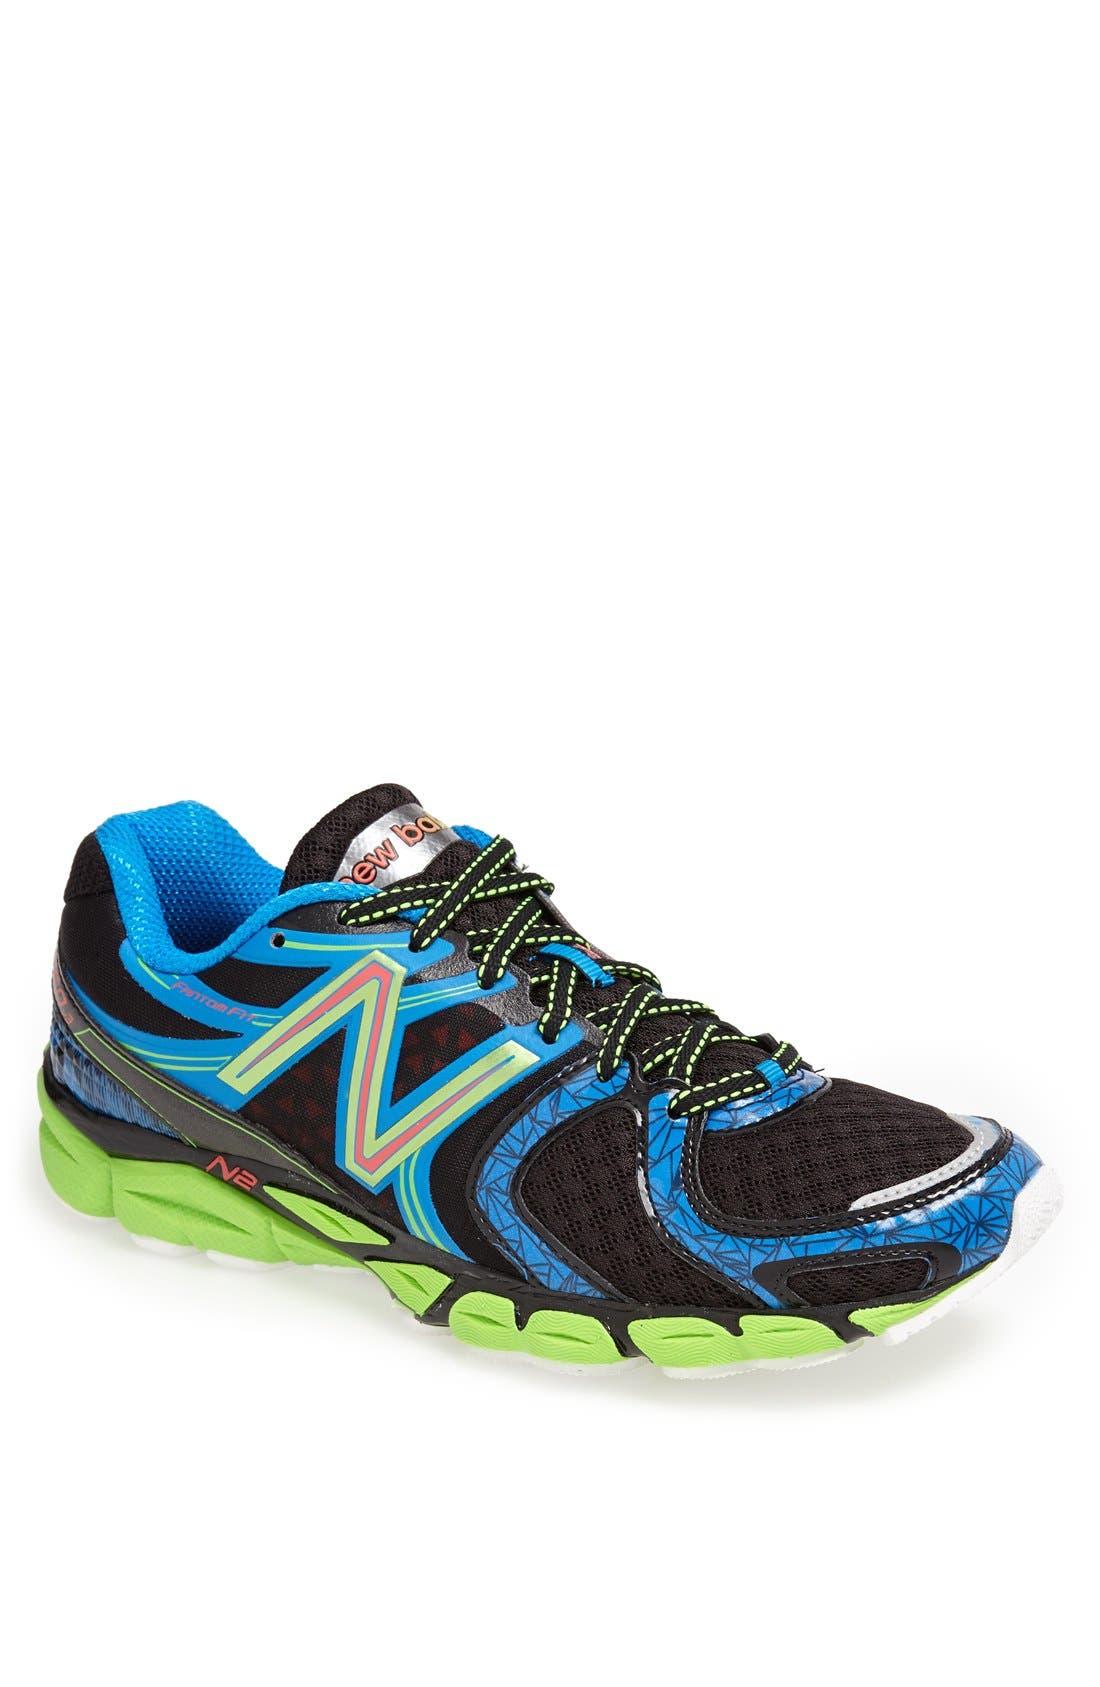 Main Image - New Balance '1260v3' Running Shoe (Men)